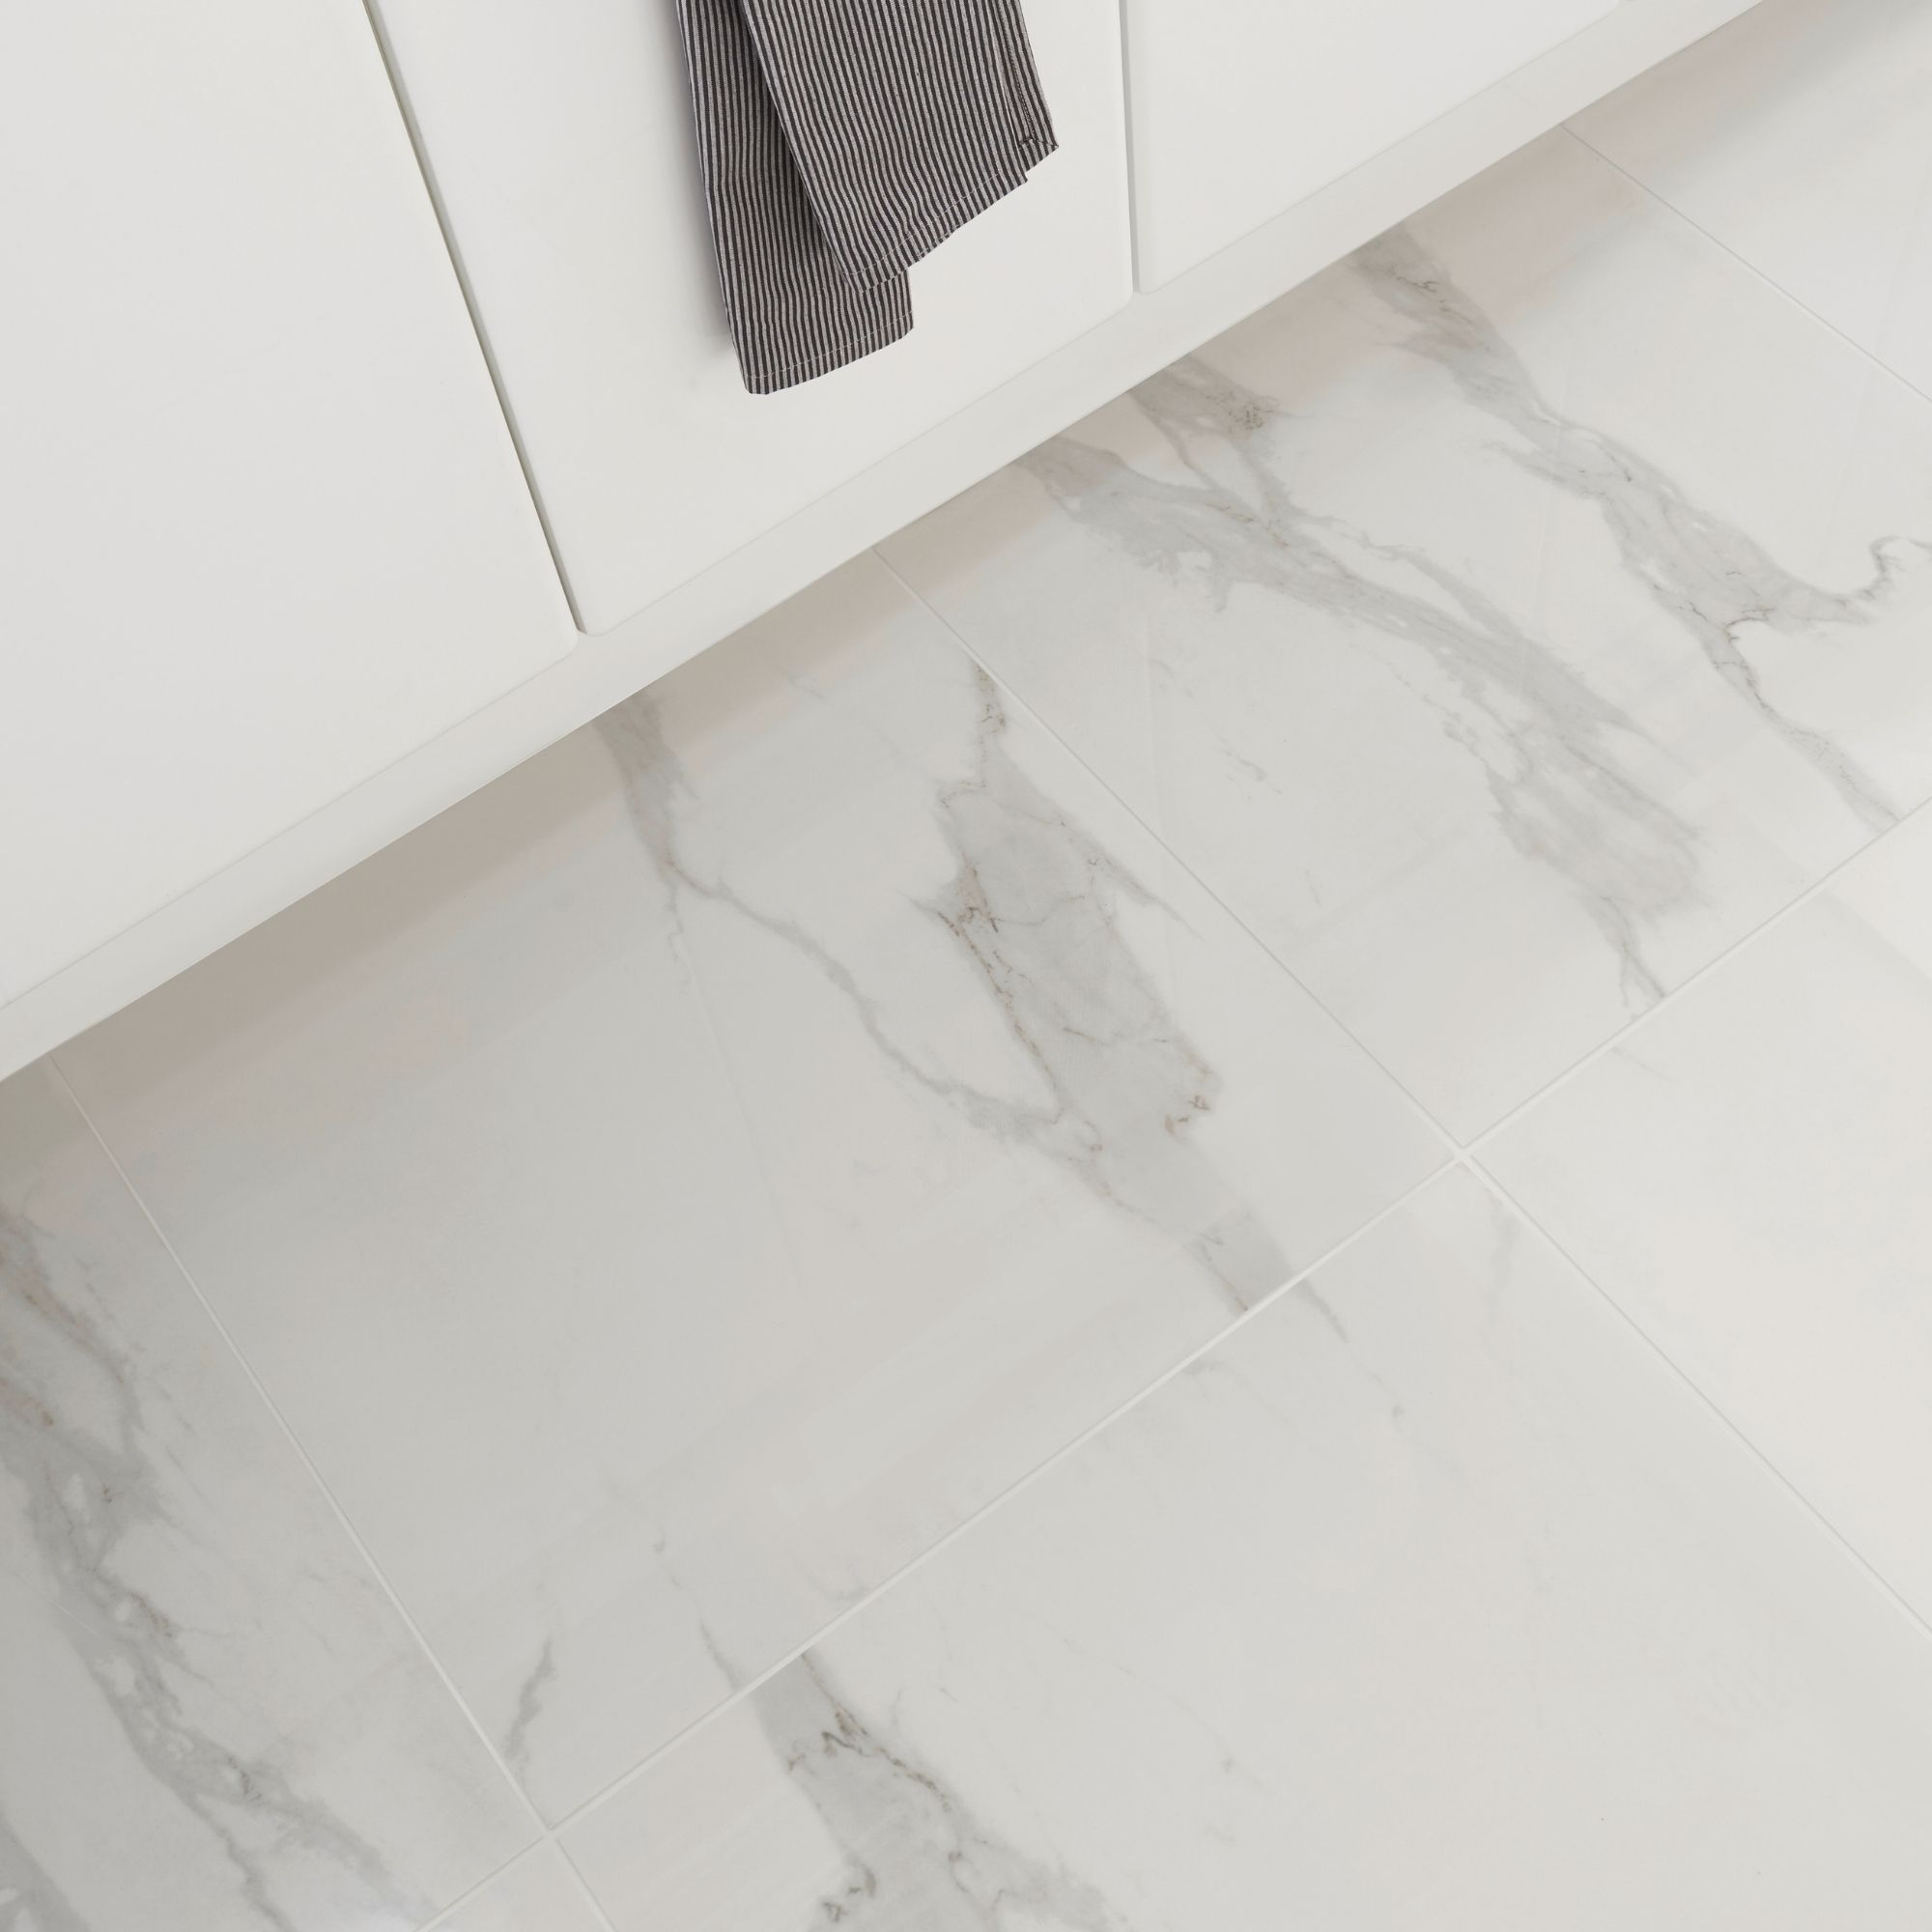 Ultimate White Marble Effect Porcelain Floor Tile Pack Of 3 L 595mm W 595mm Departments Diy At B Q